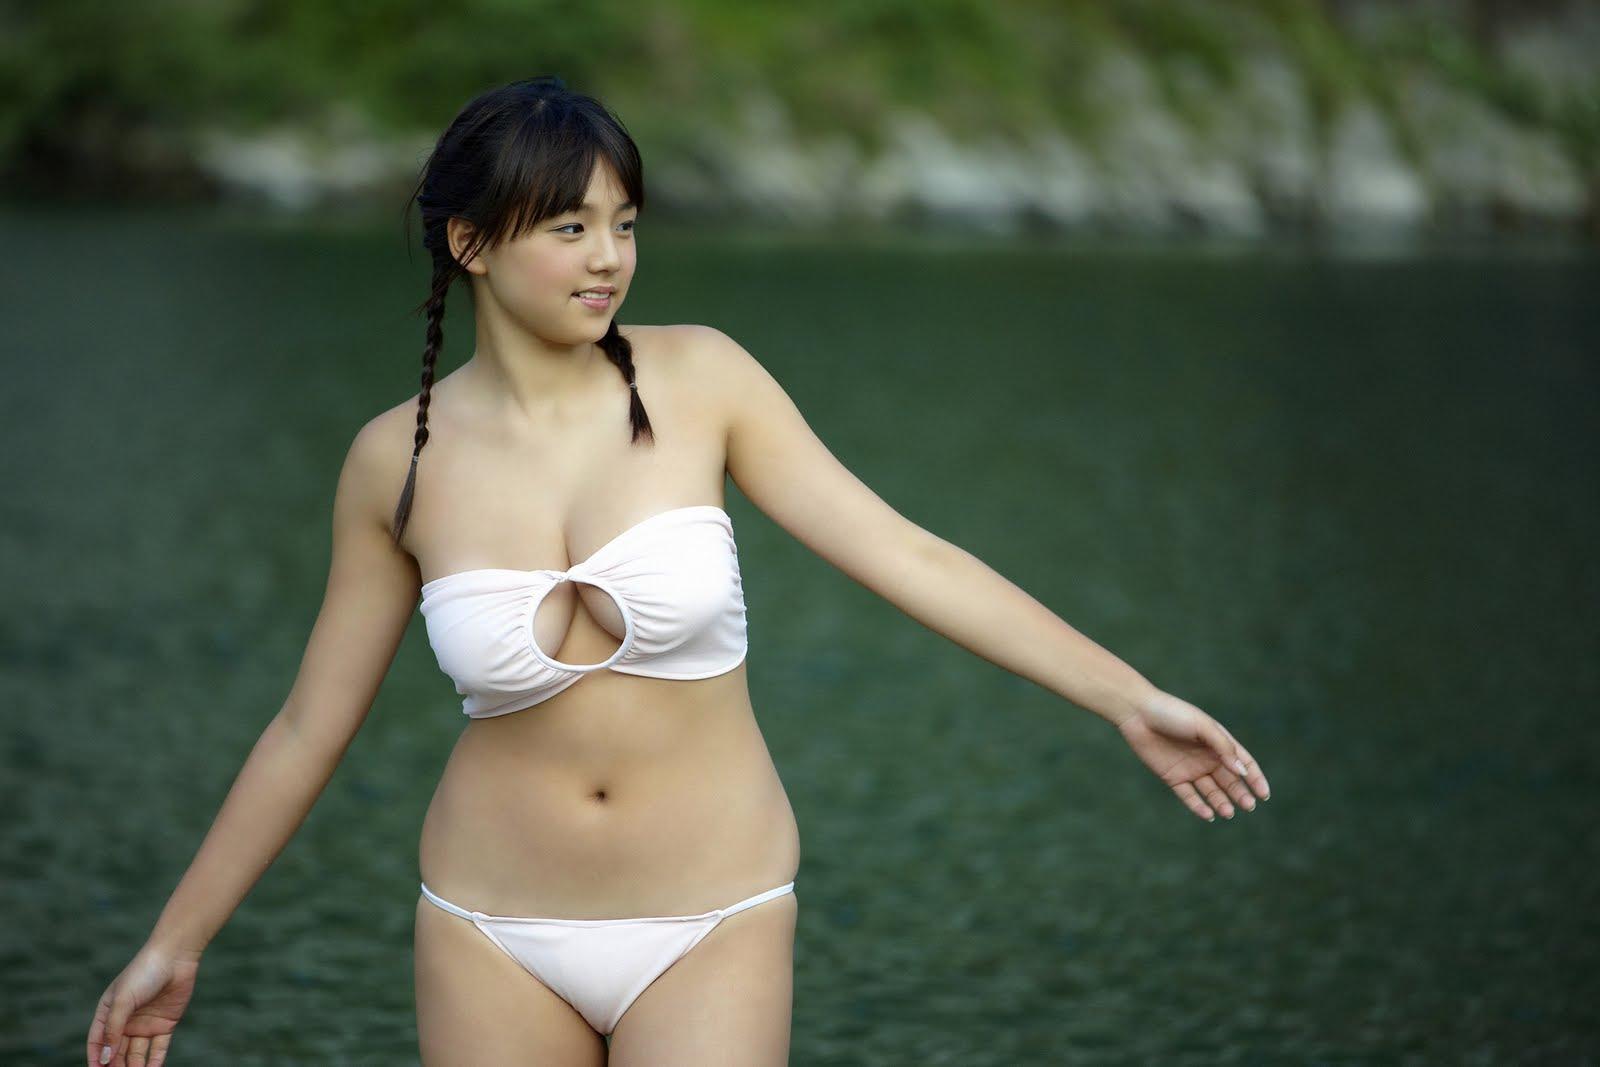 japanese nude model pics